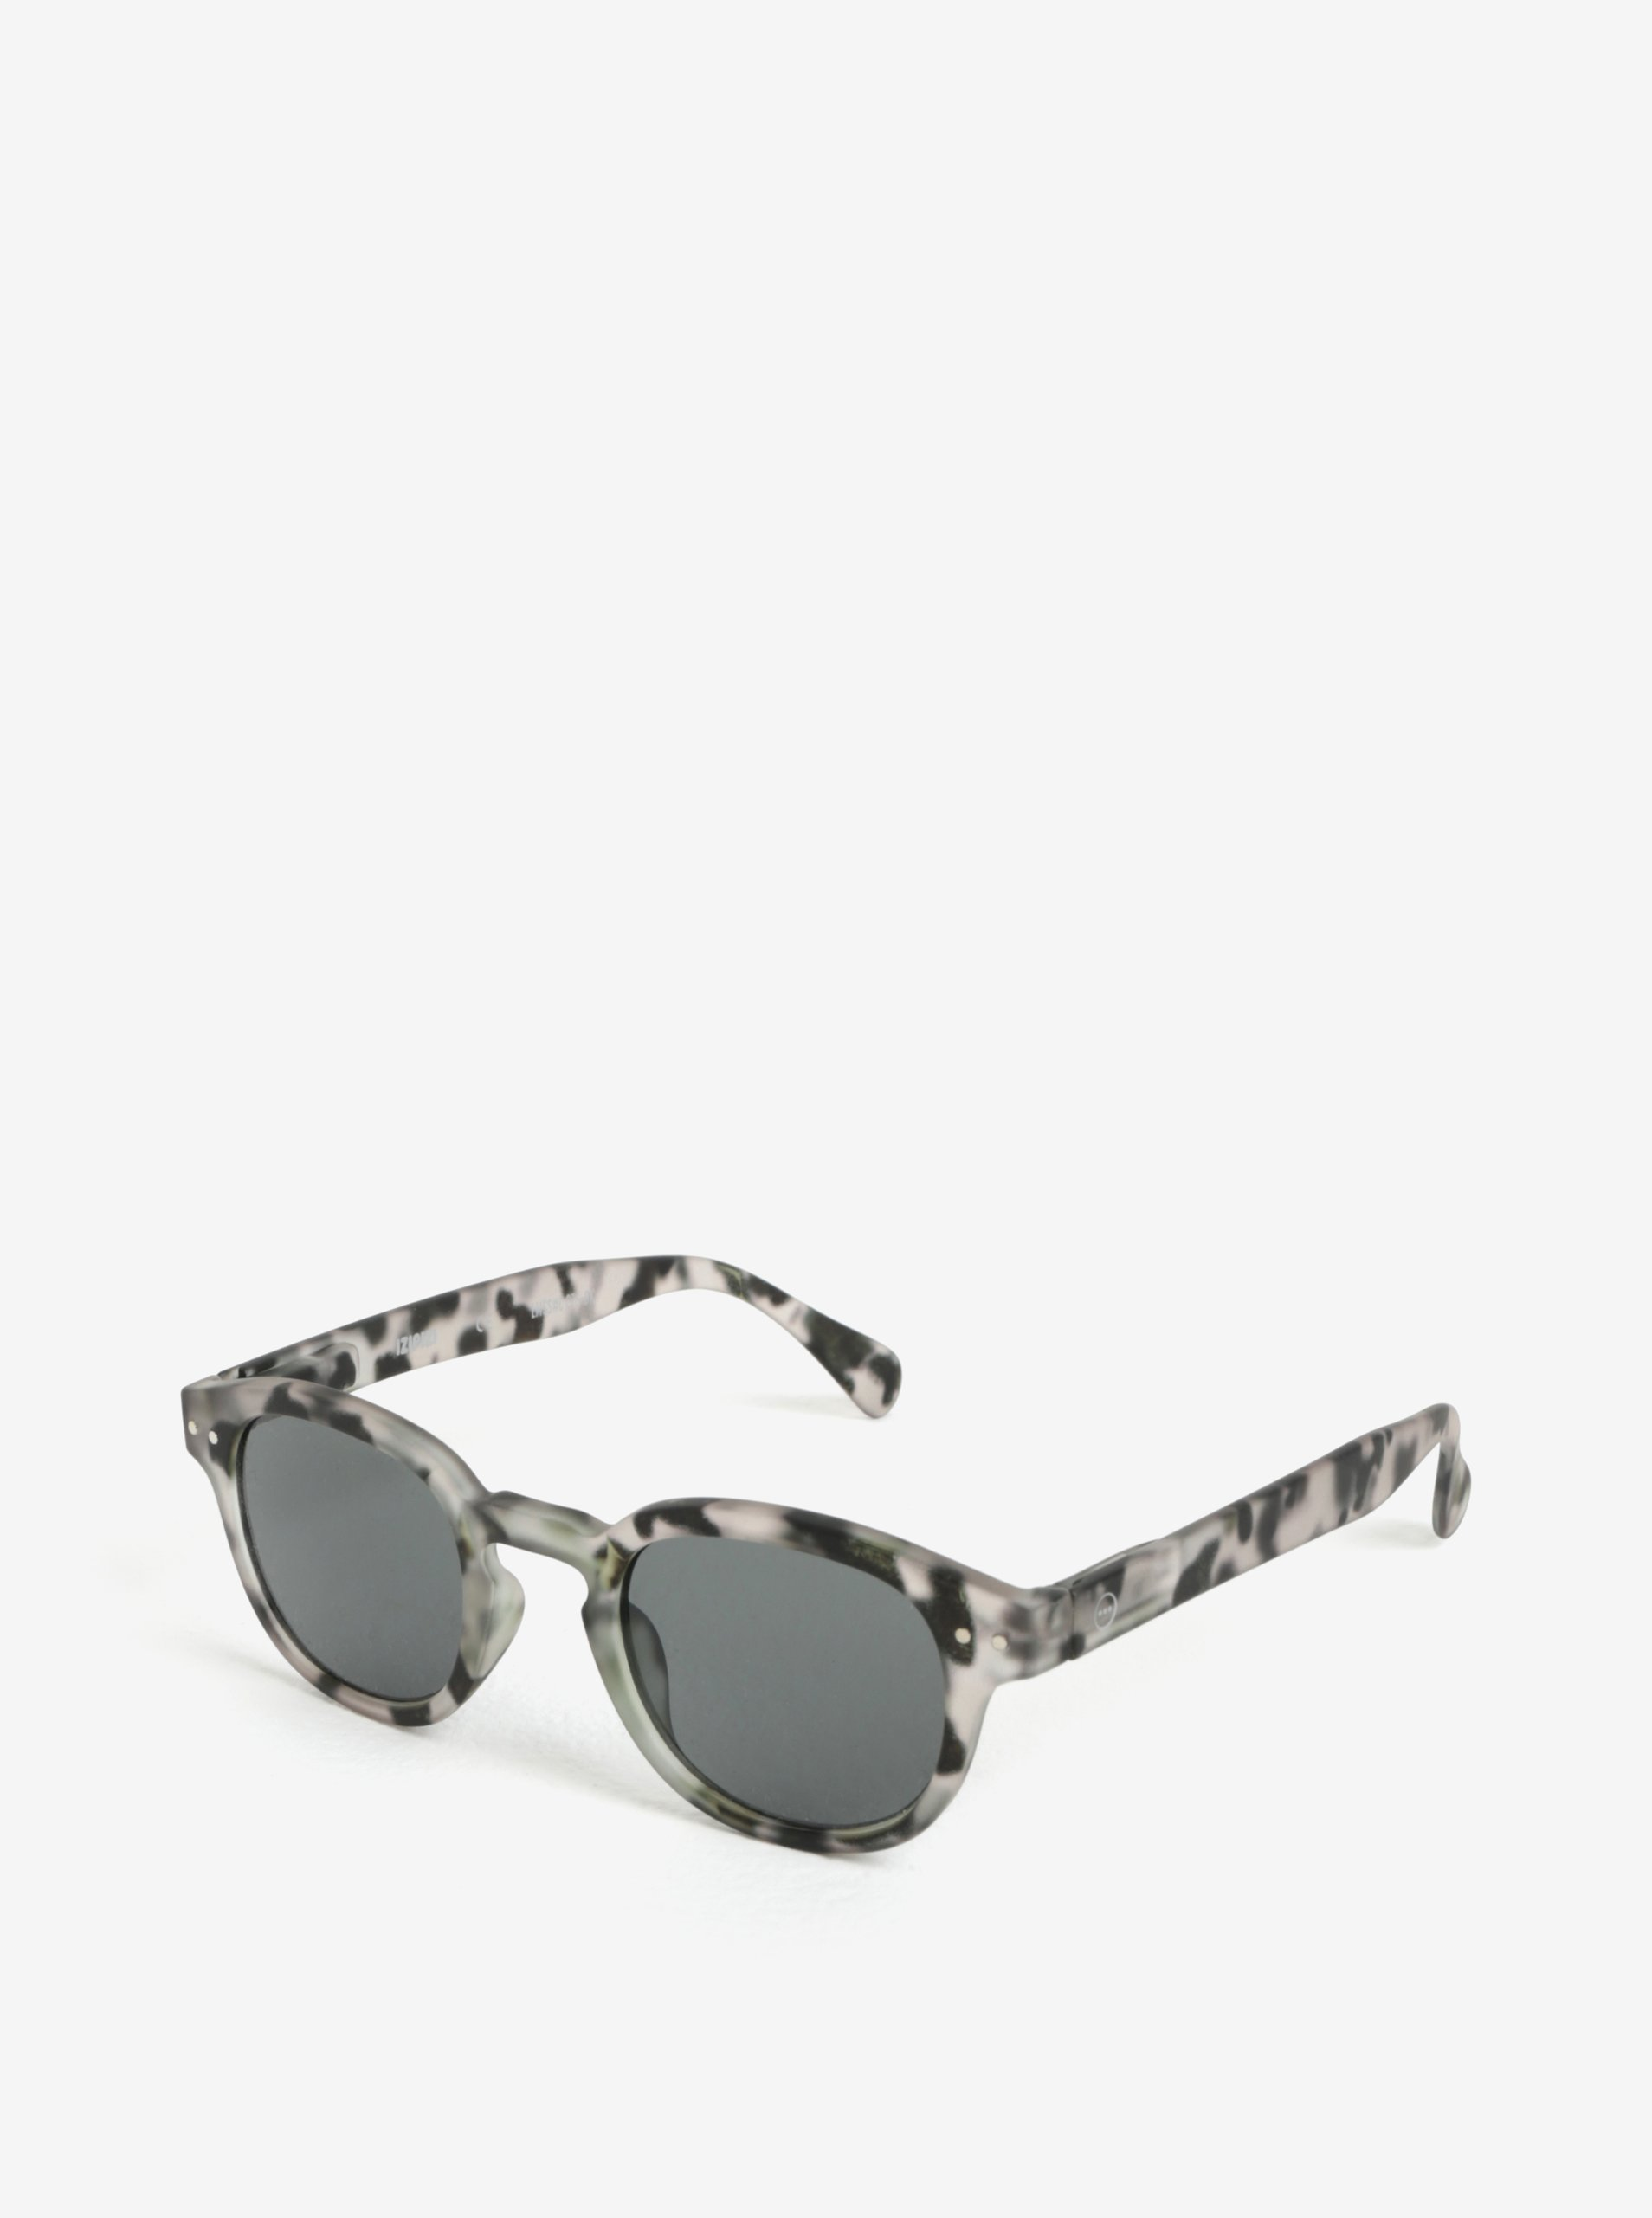 Sivé vzorované unisex slnečné okuliare IZIPIZI #C